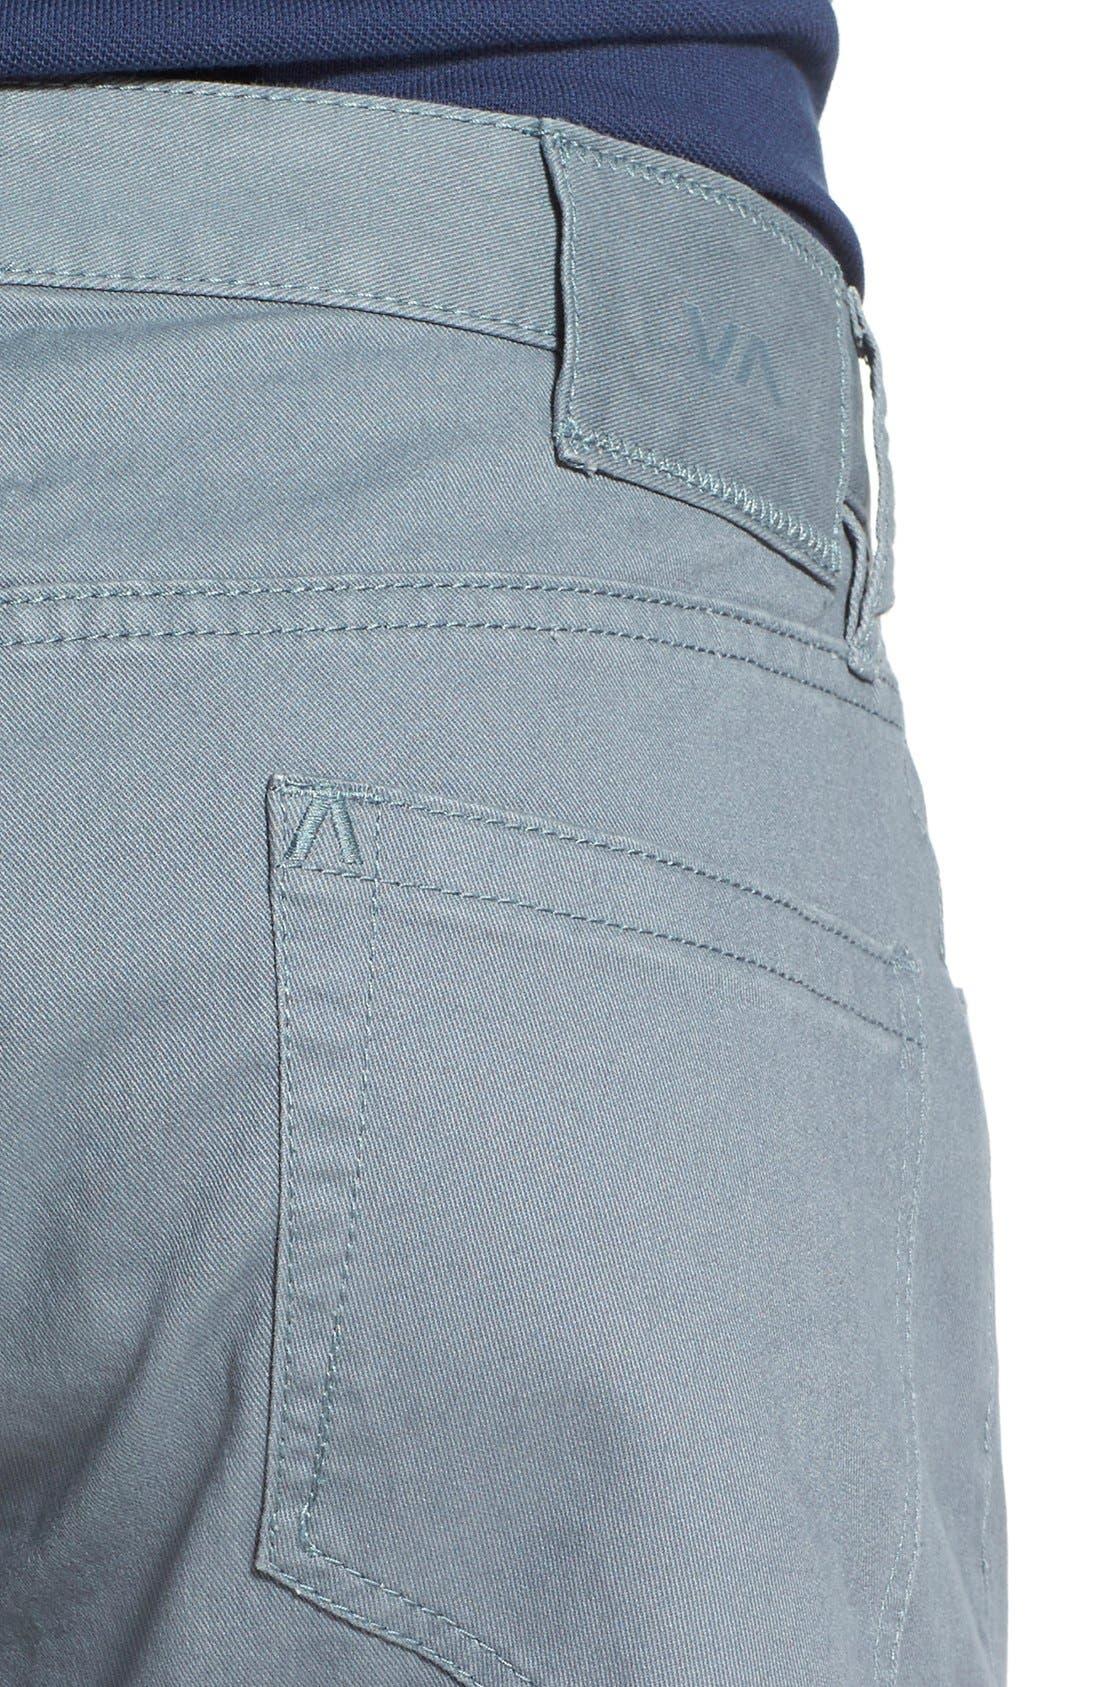 Alternate Image 4  - RVCA 'Stay RVCA' Slim Straight Pants (Online Only)